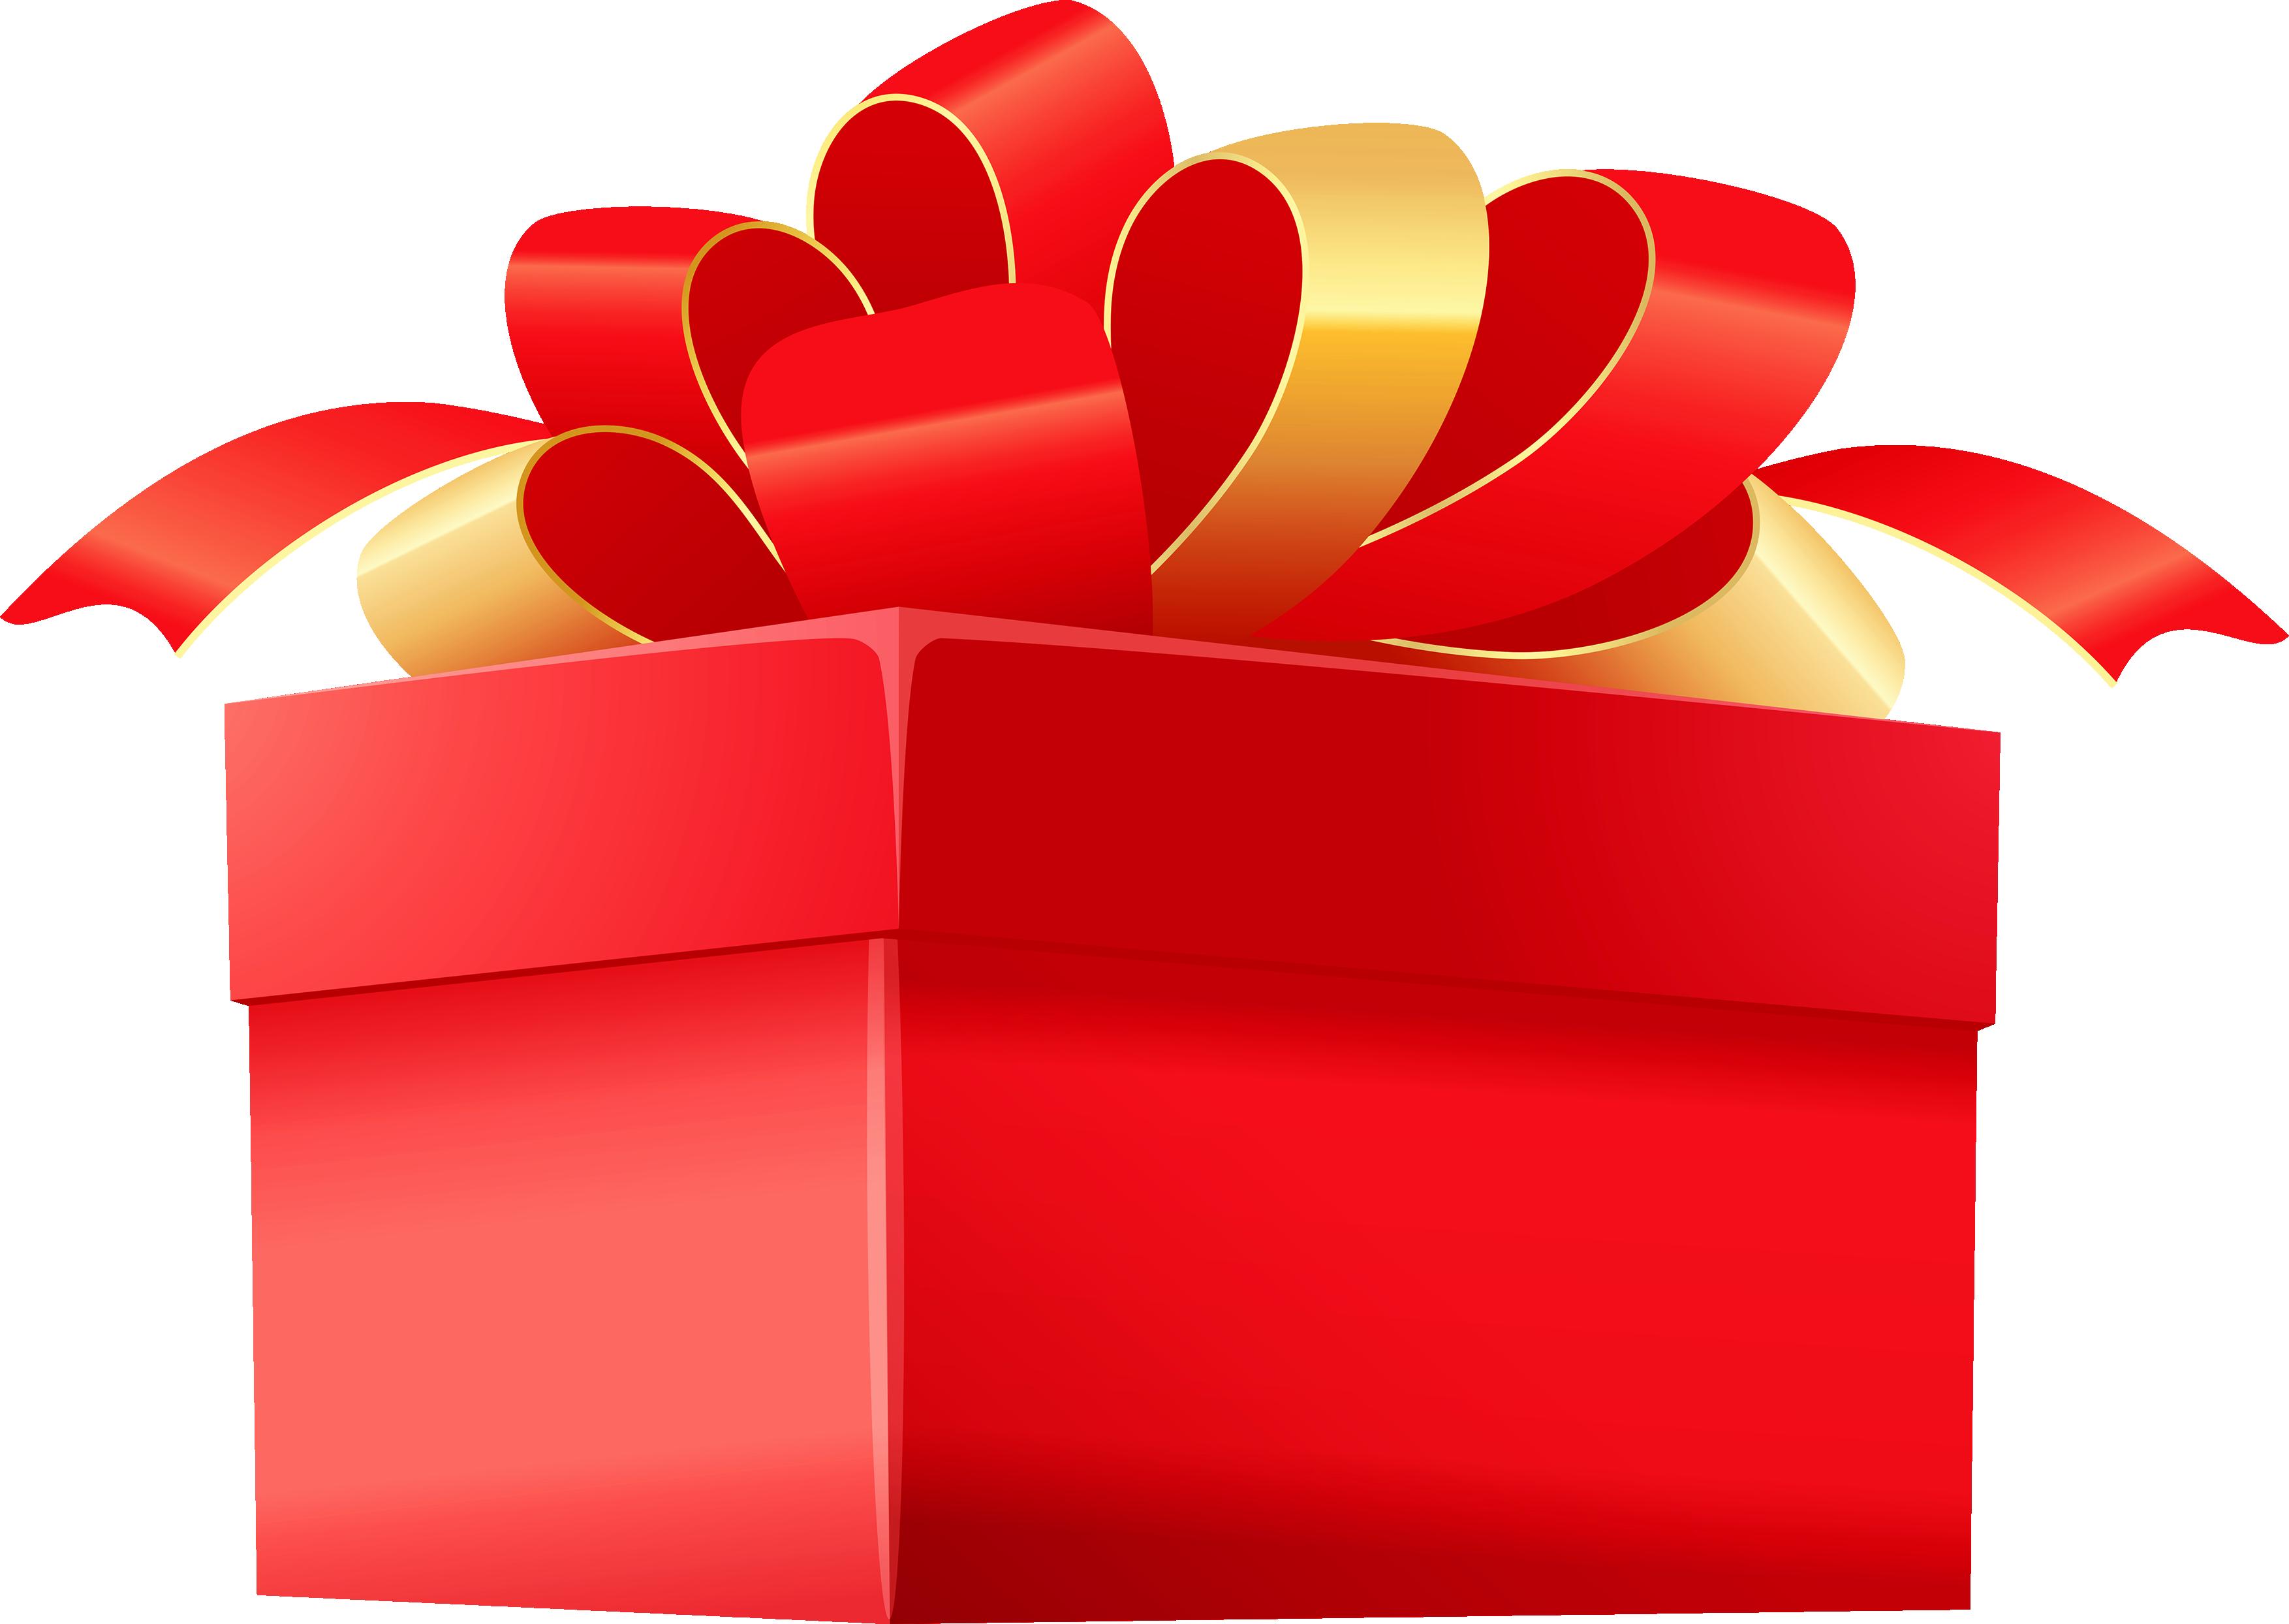 Money gift clipart image freeuse Shiny present box clipart - ClipartFest image freeuse